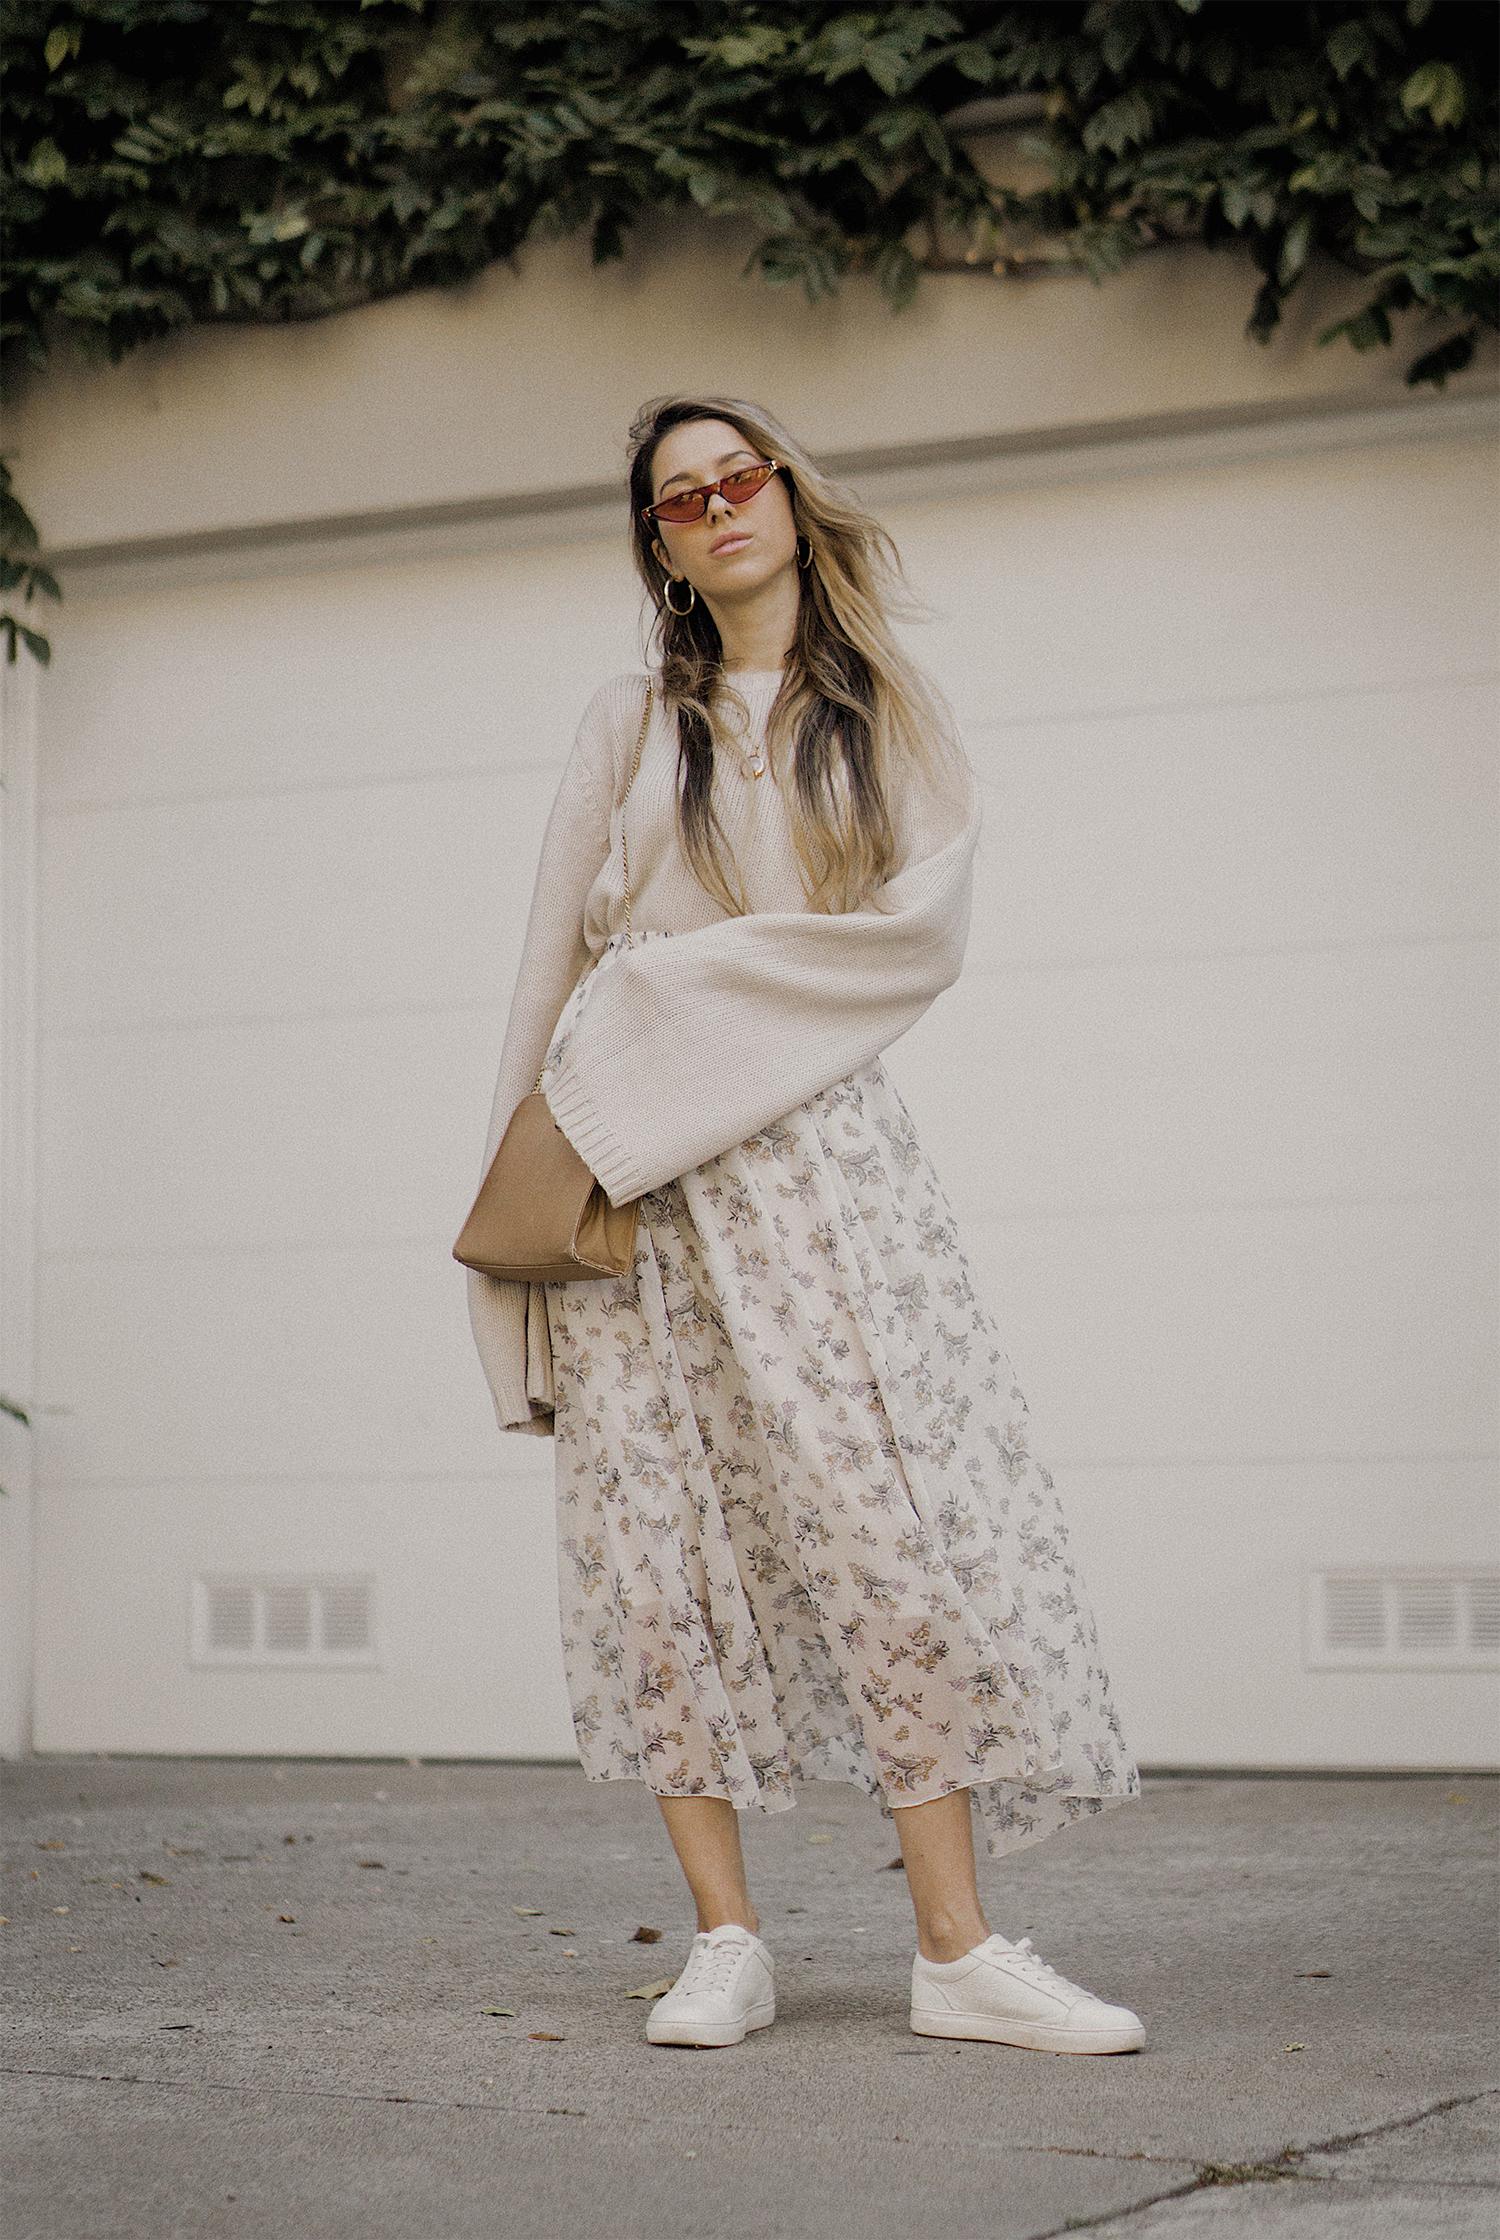 neutral_outfit_street_style_look_beige_tobi_sweater_long_skirt_romantic_beret_sneakers_vintage_lena_juice_the_white_ocean_05